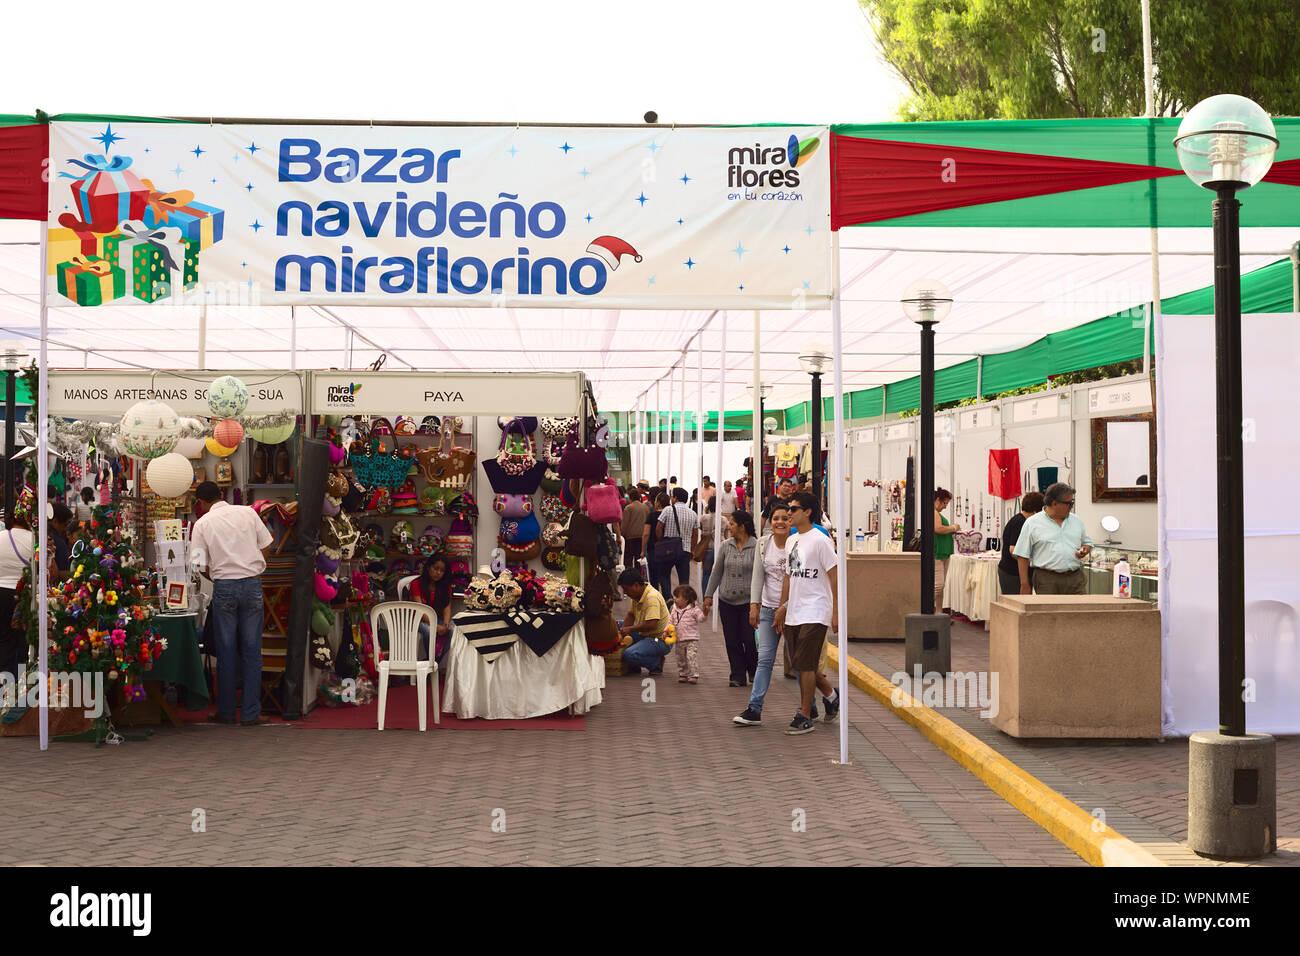 Christmas Bazaar Near Me.Lima Peru December 13 2011 Unidentified People On The